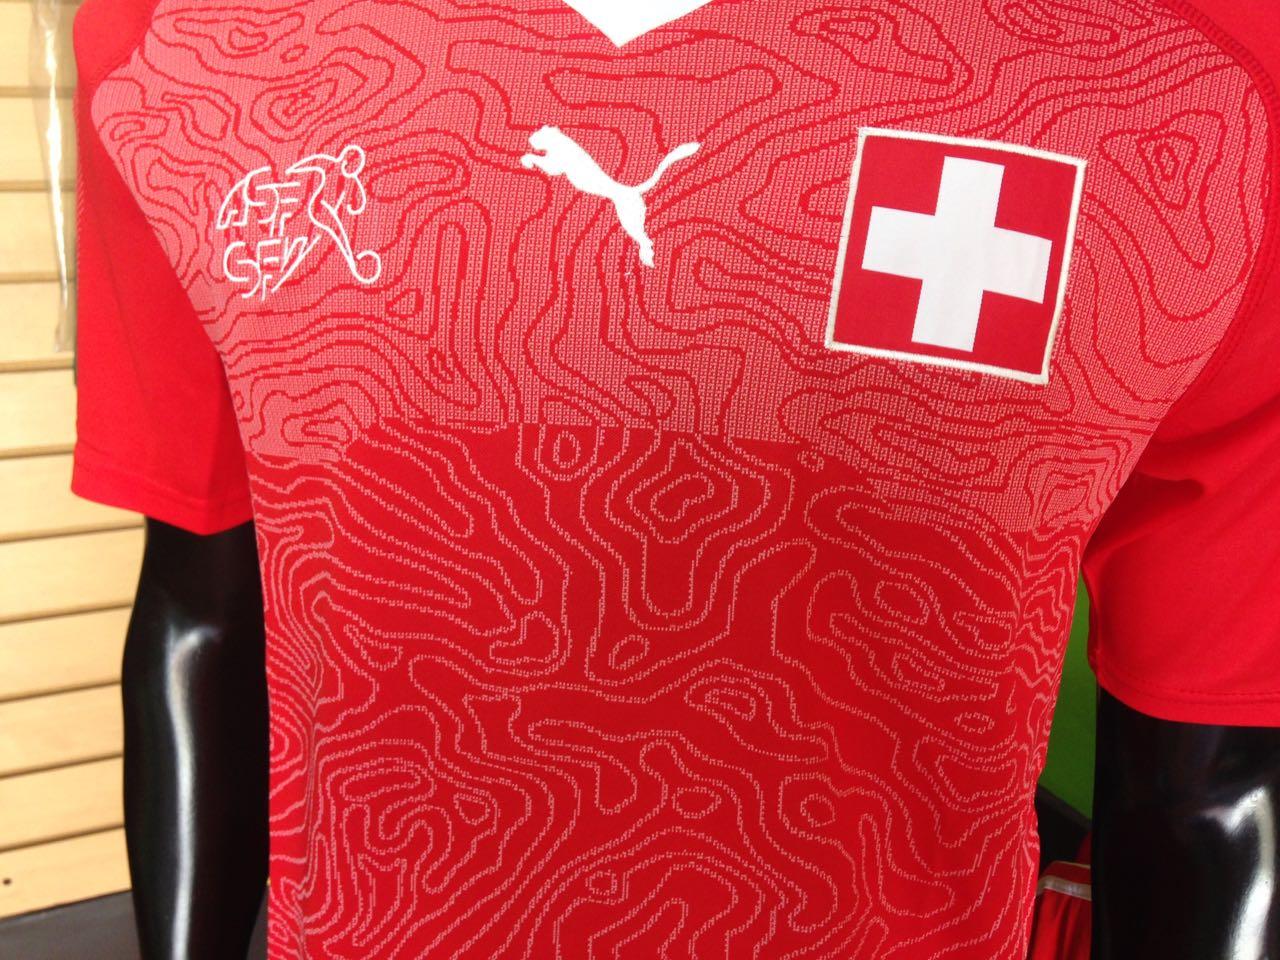 camiseta selecci 243 n suiza 2018 f 250 tbol de primera